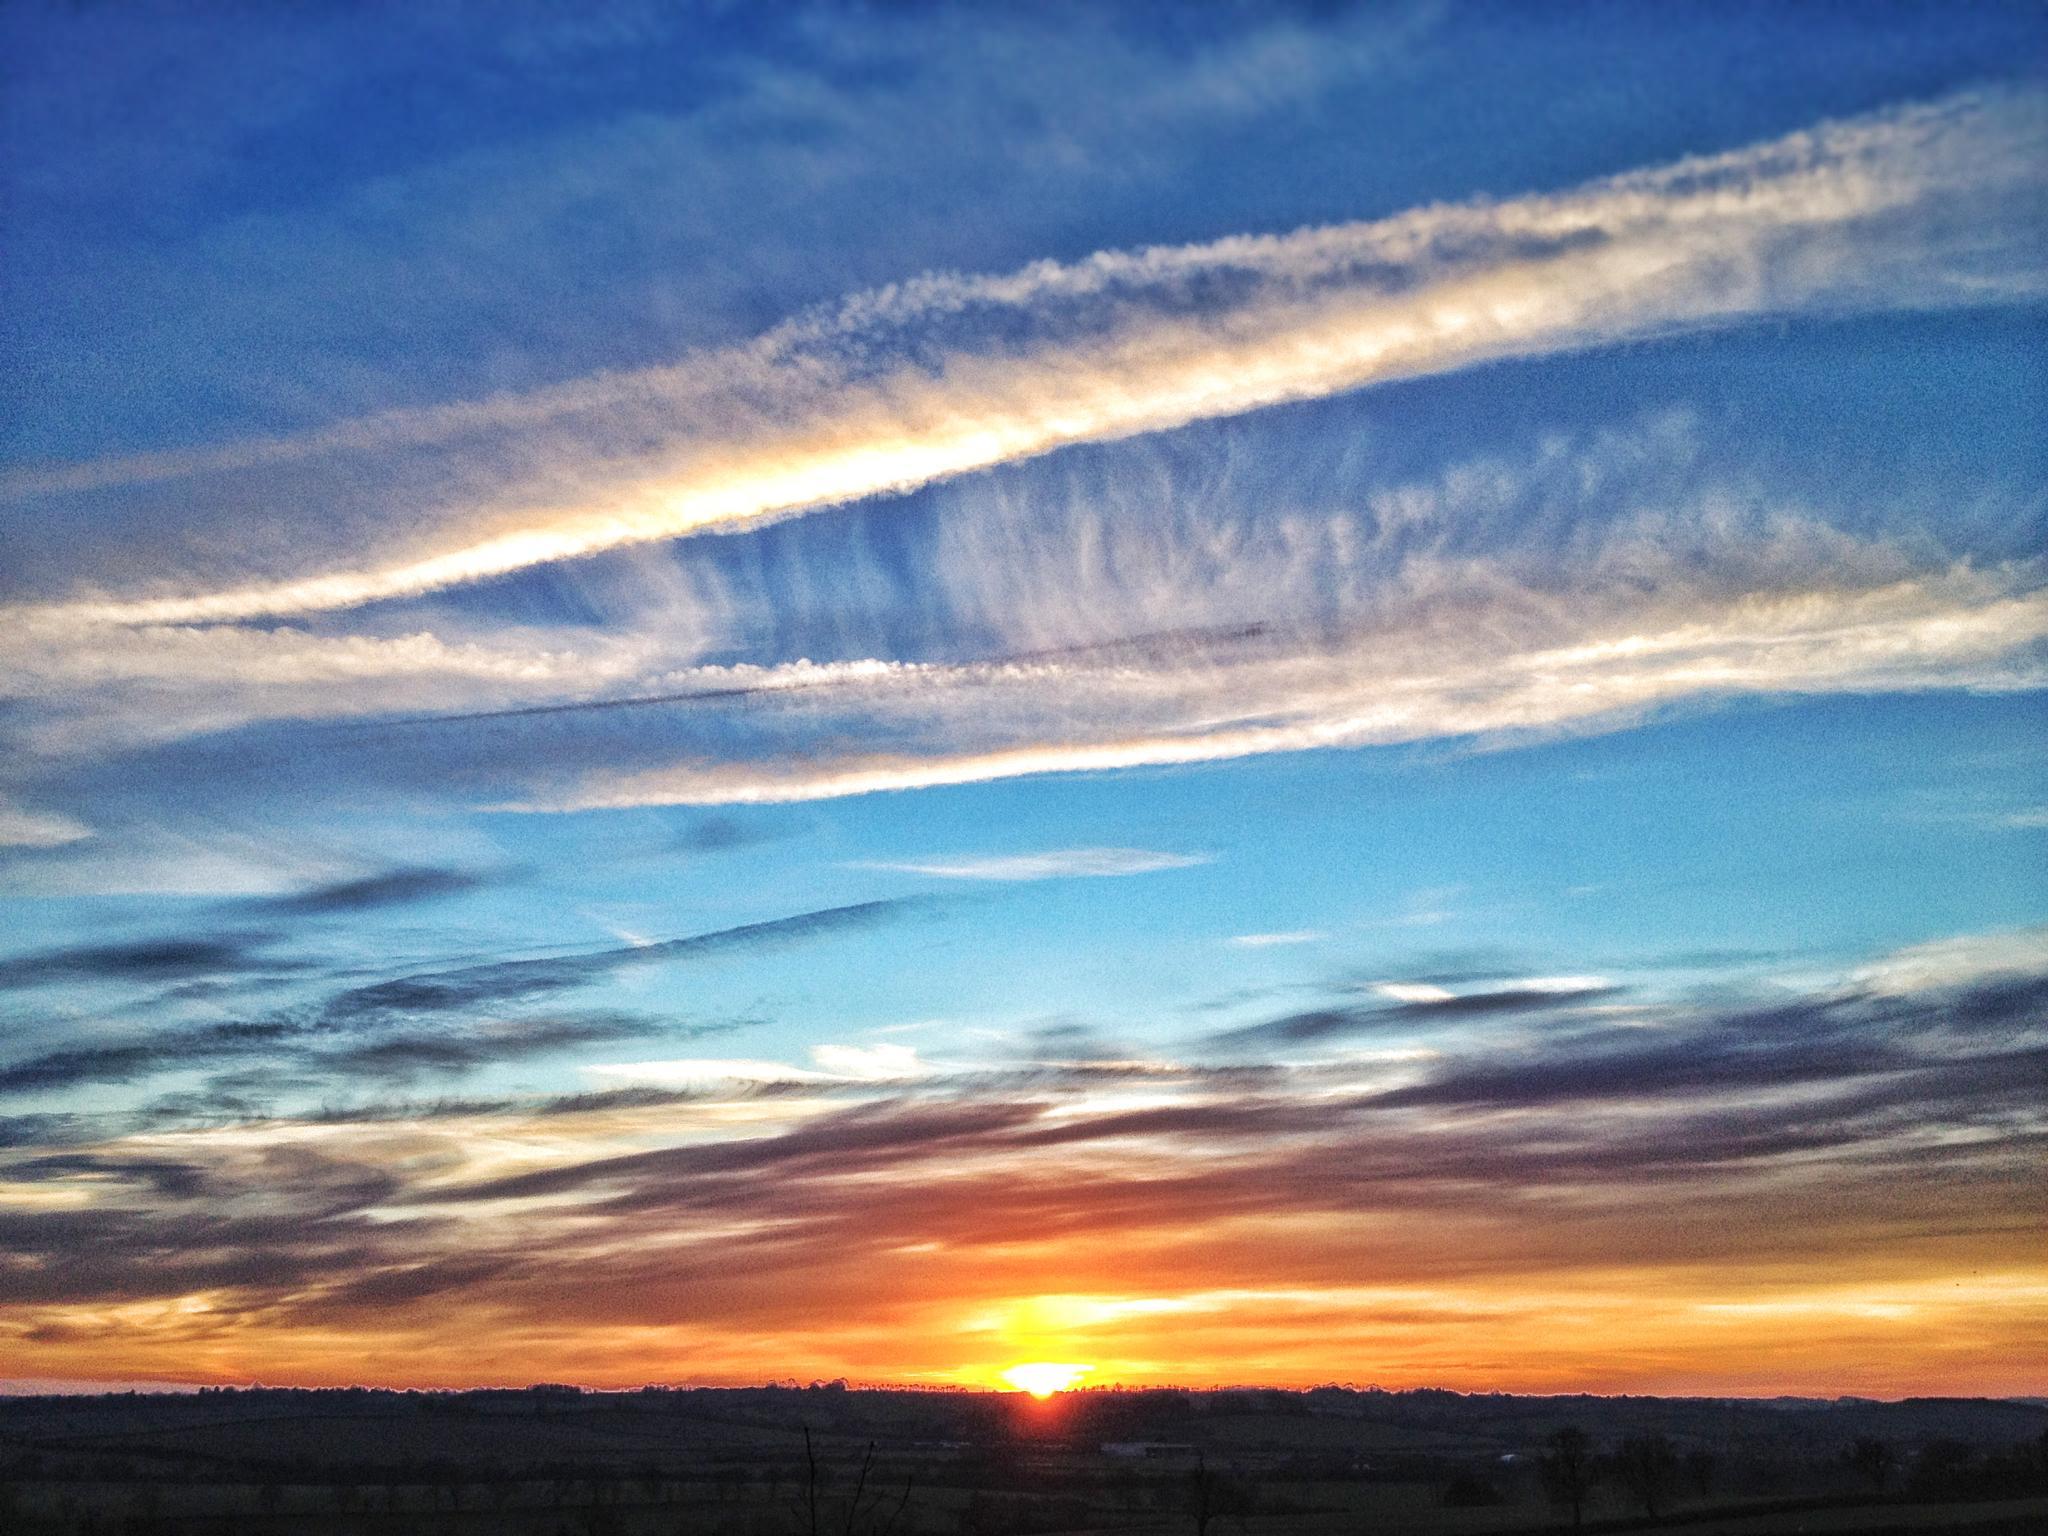 Sunset 2012 by Luke Barklamb